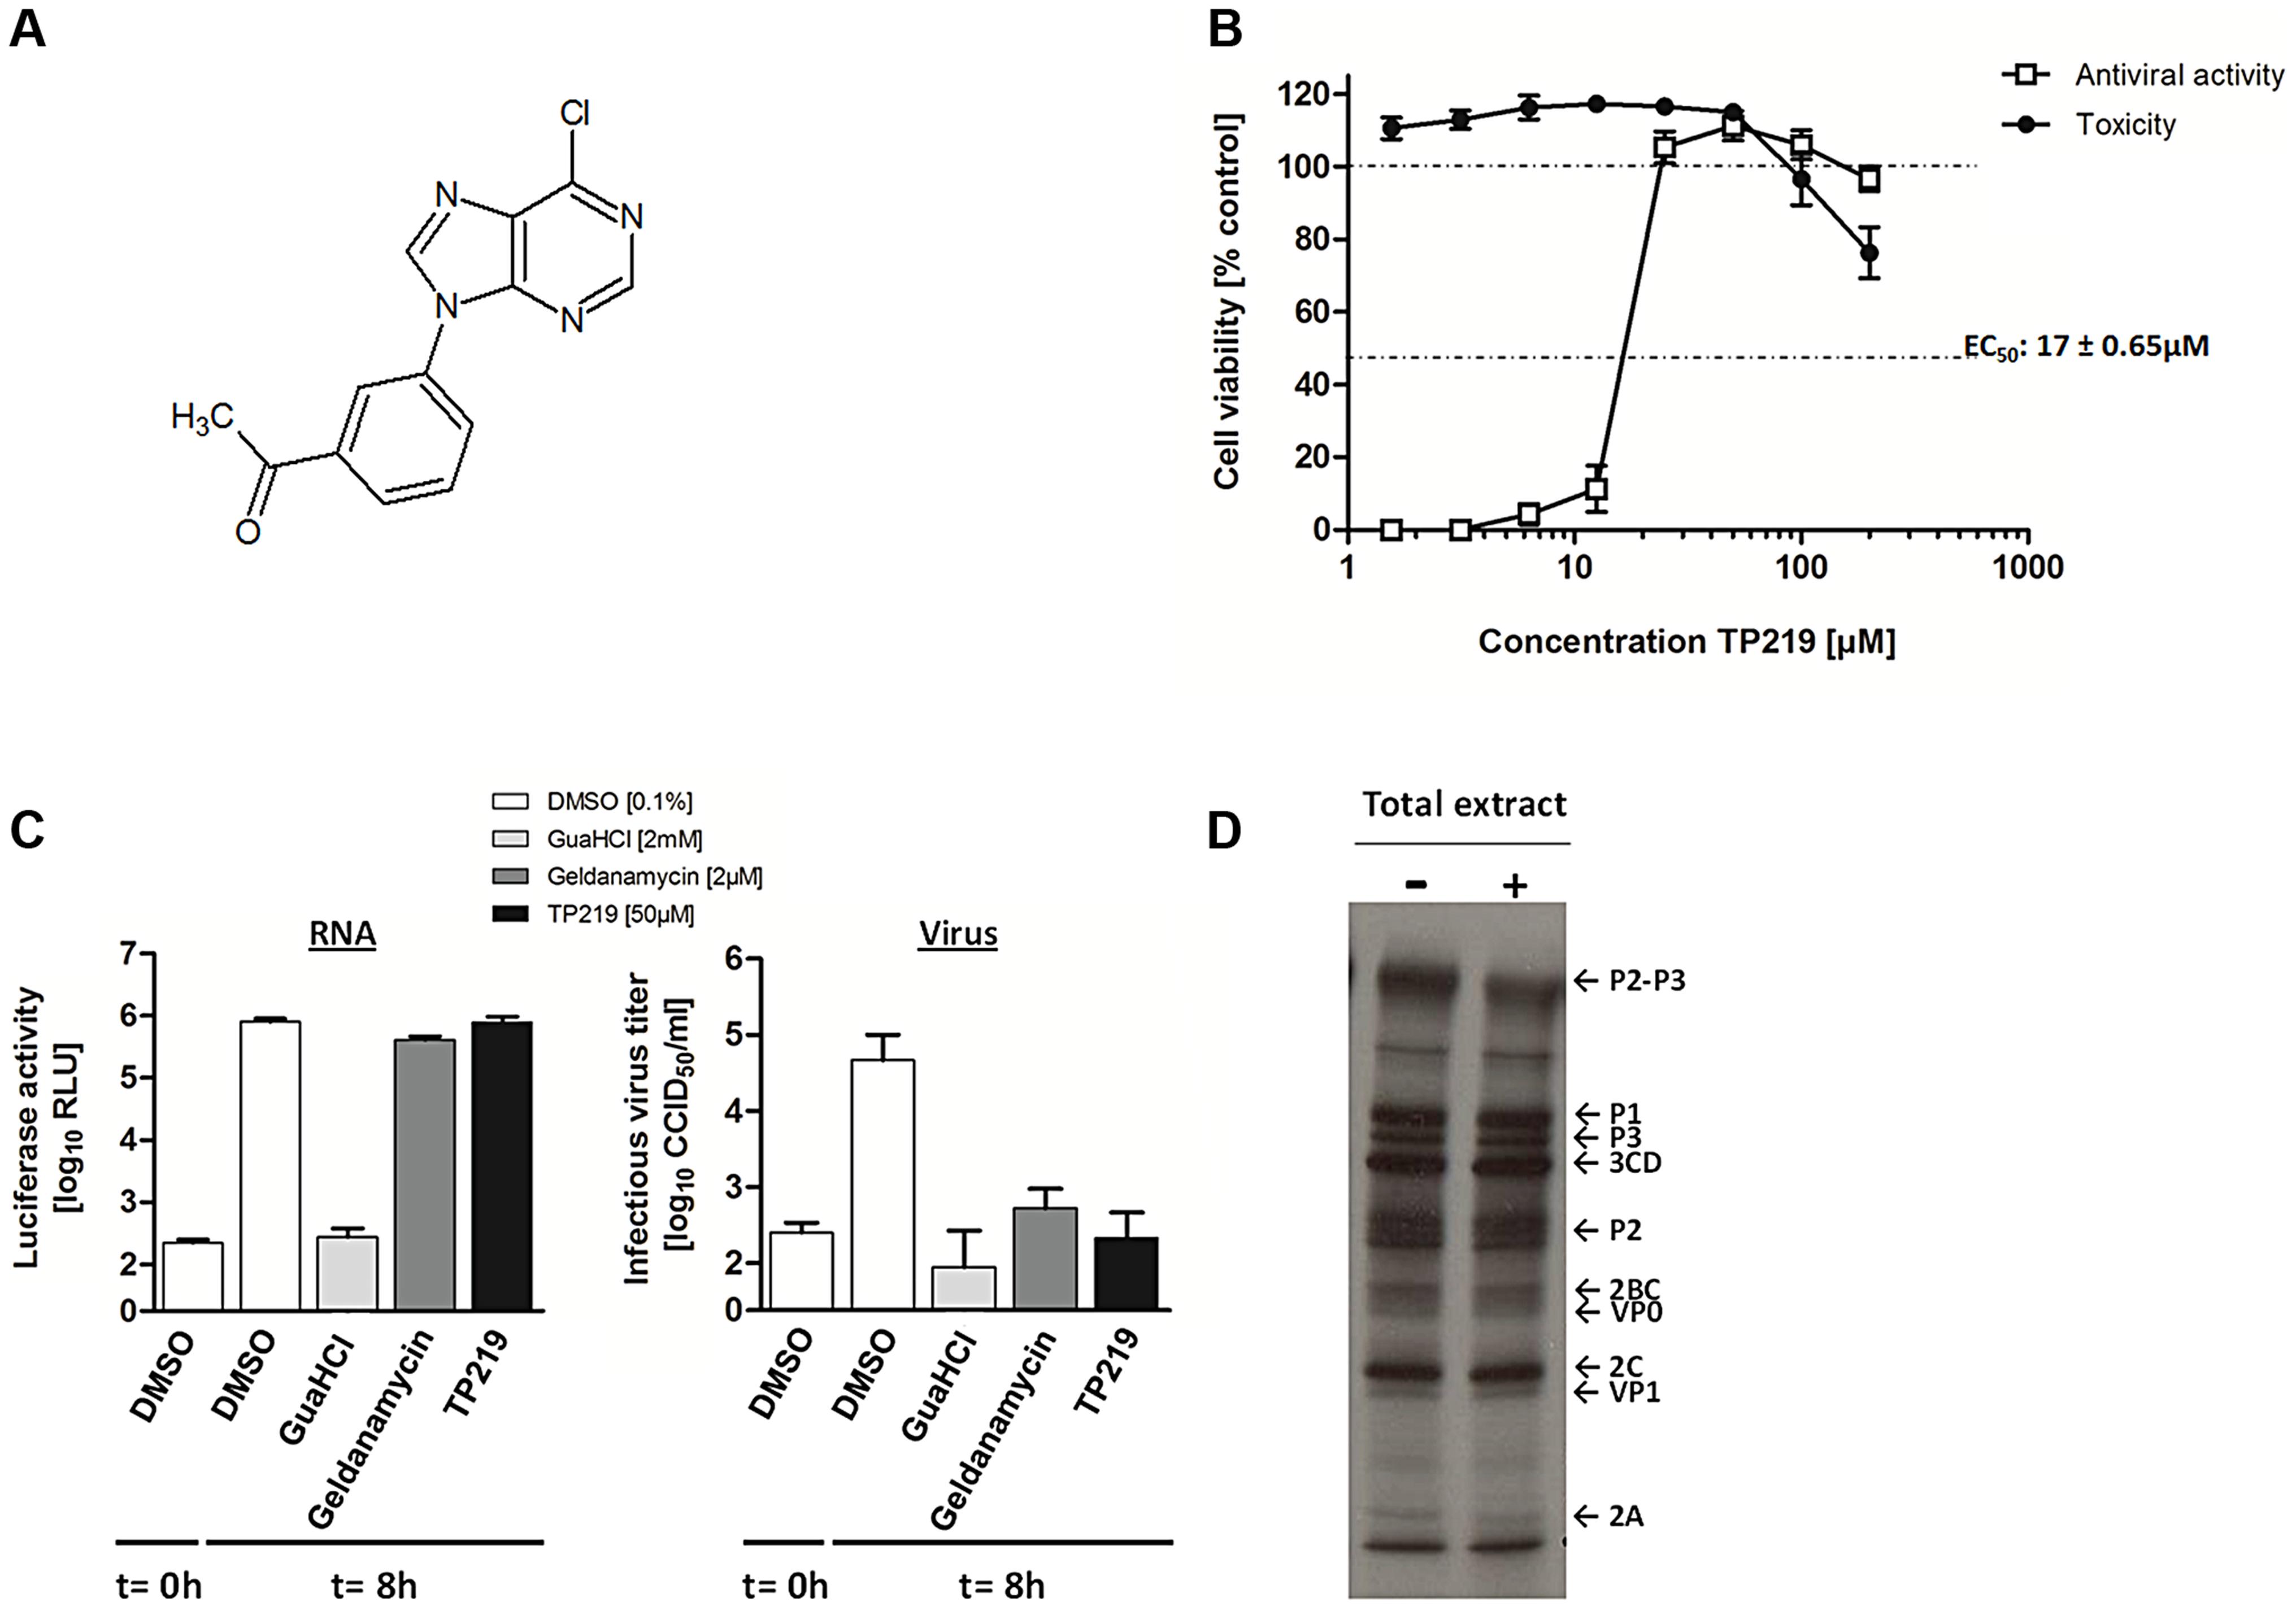 TP219 inhibits virus morphogenesis.